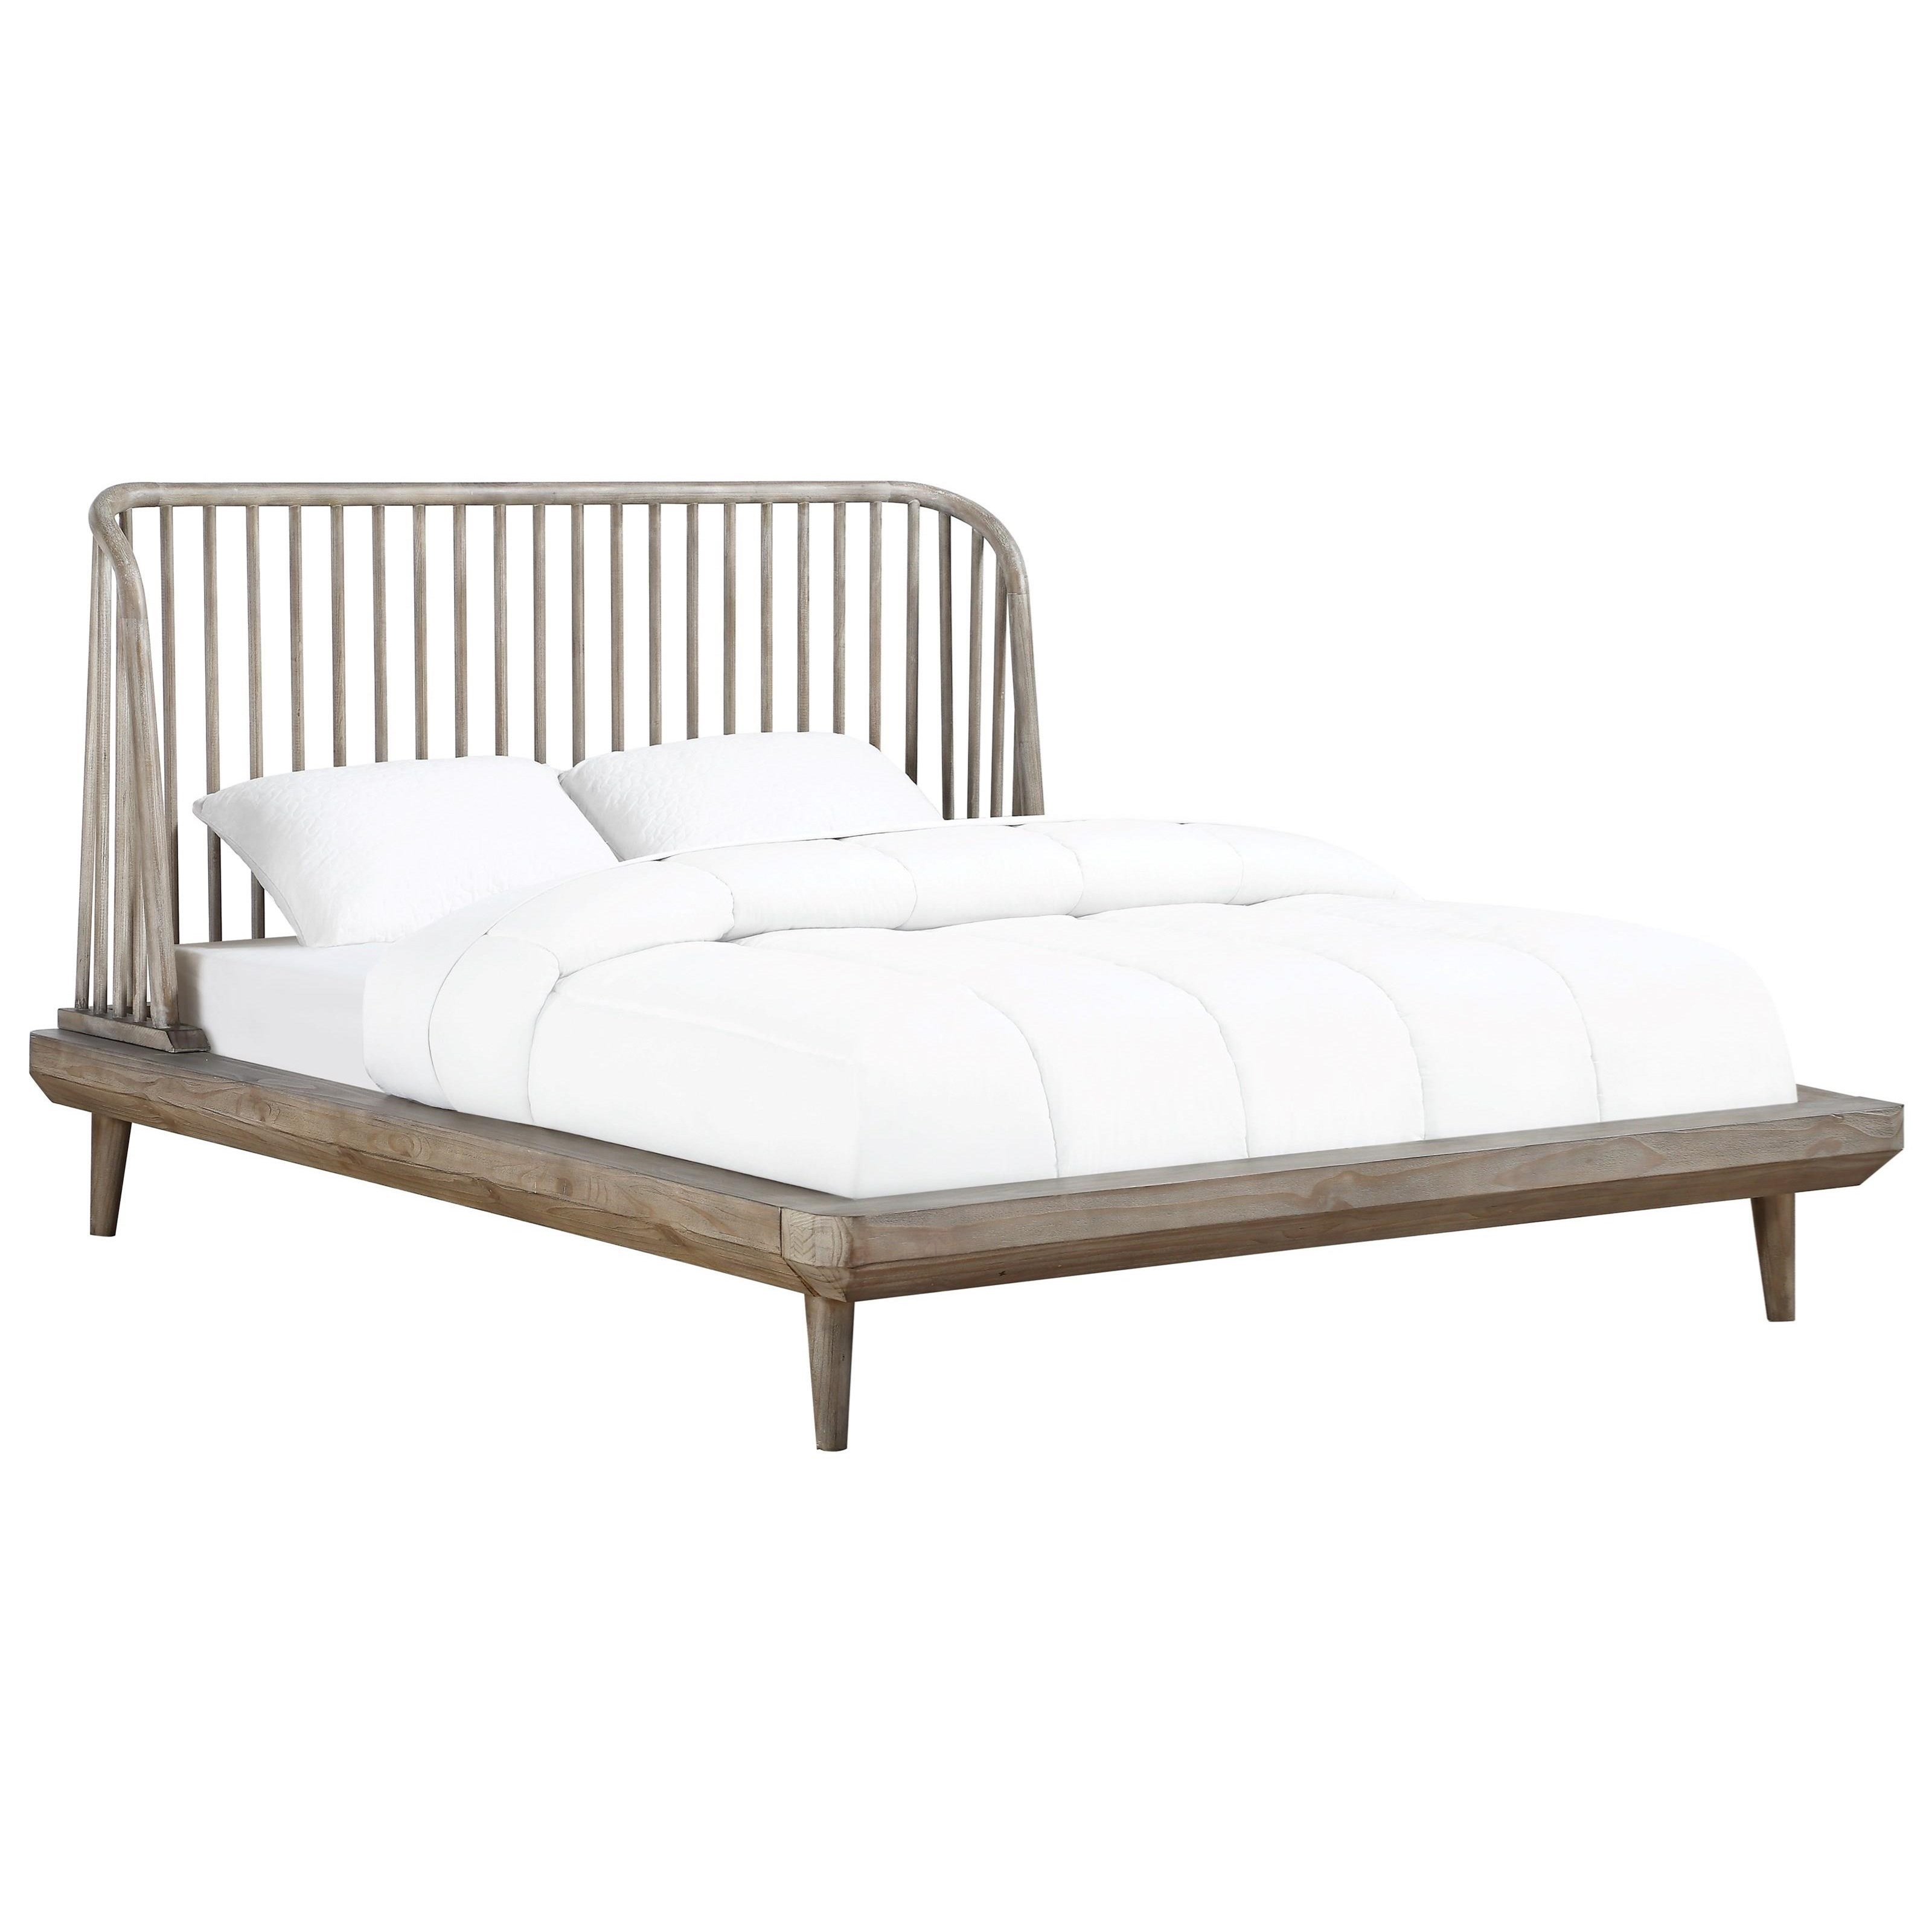 Modus International Spindle Queen Platform Bed With Spindle Headboard A1 Furniture Mattress Platform Beds Low Profile Beds